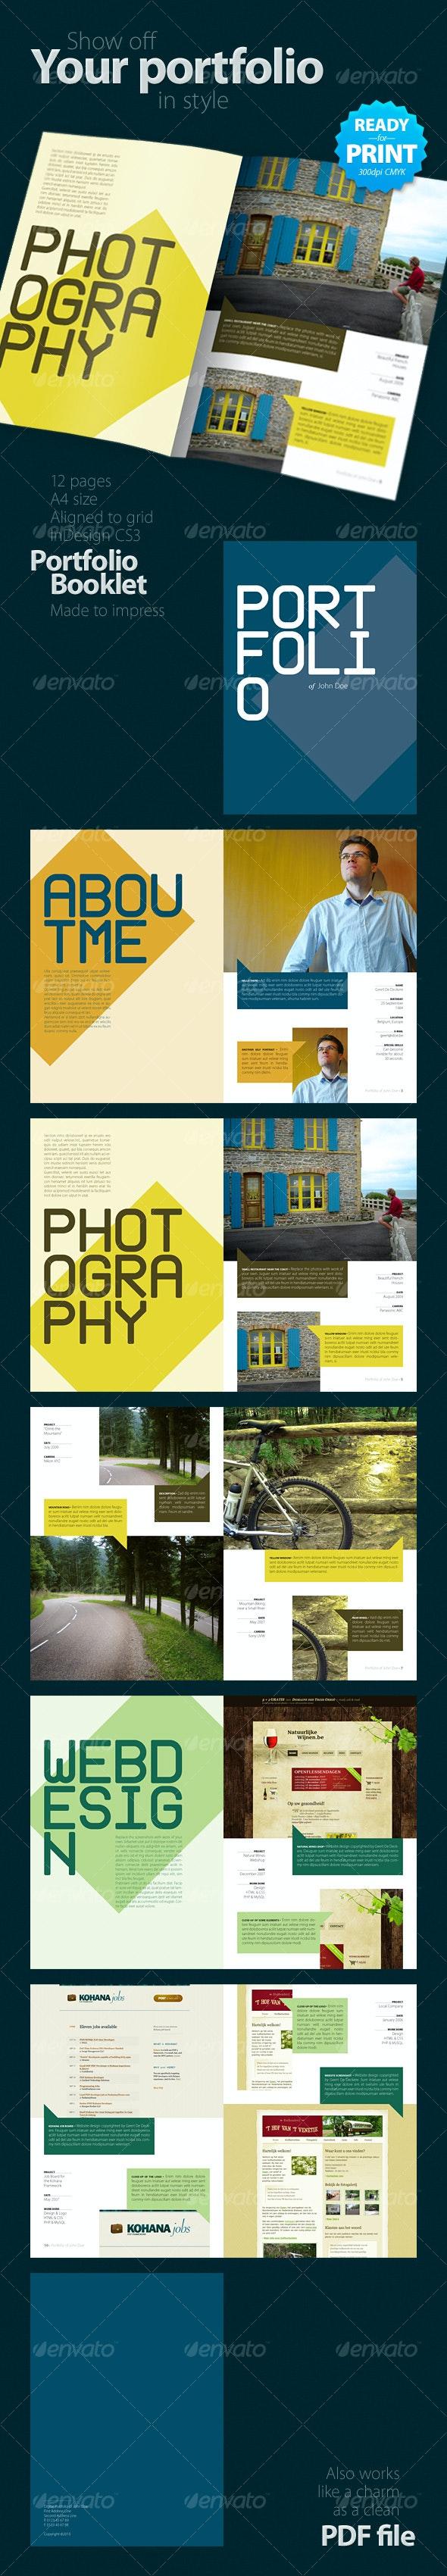 Portfolio Booklet (12 pages) - Portfolio Brochures